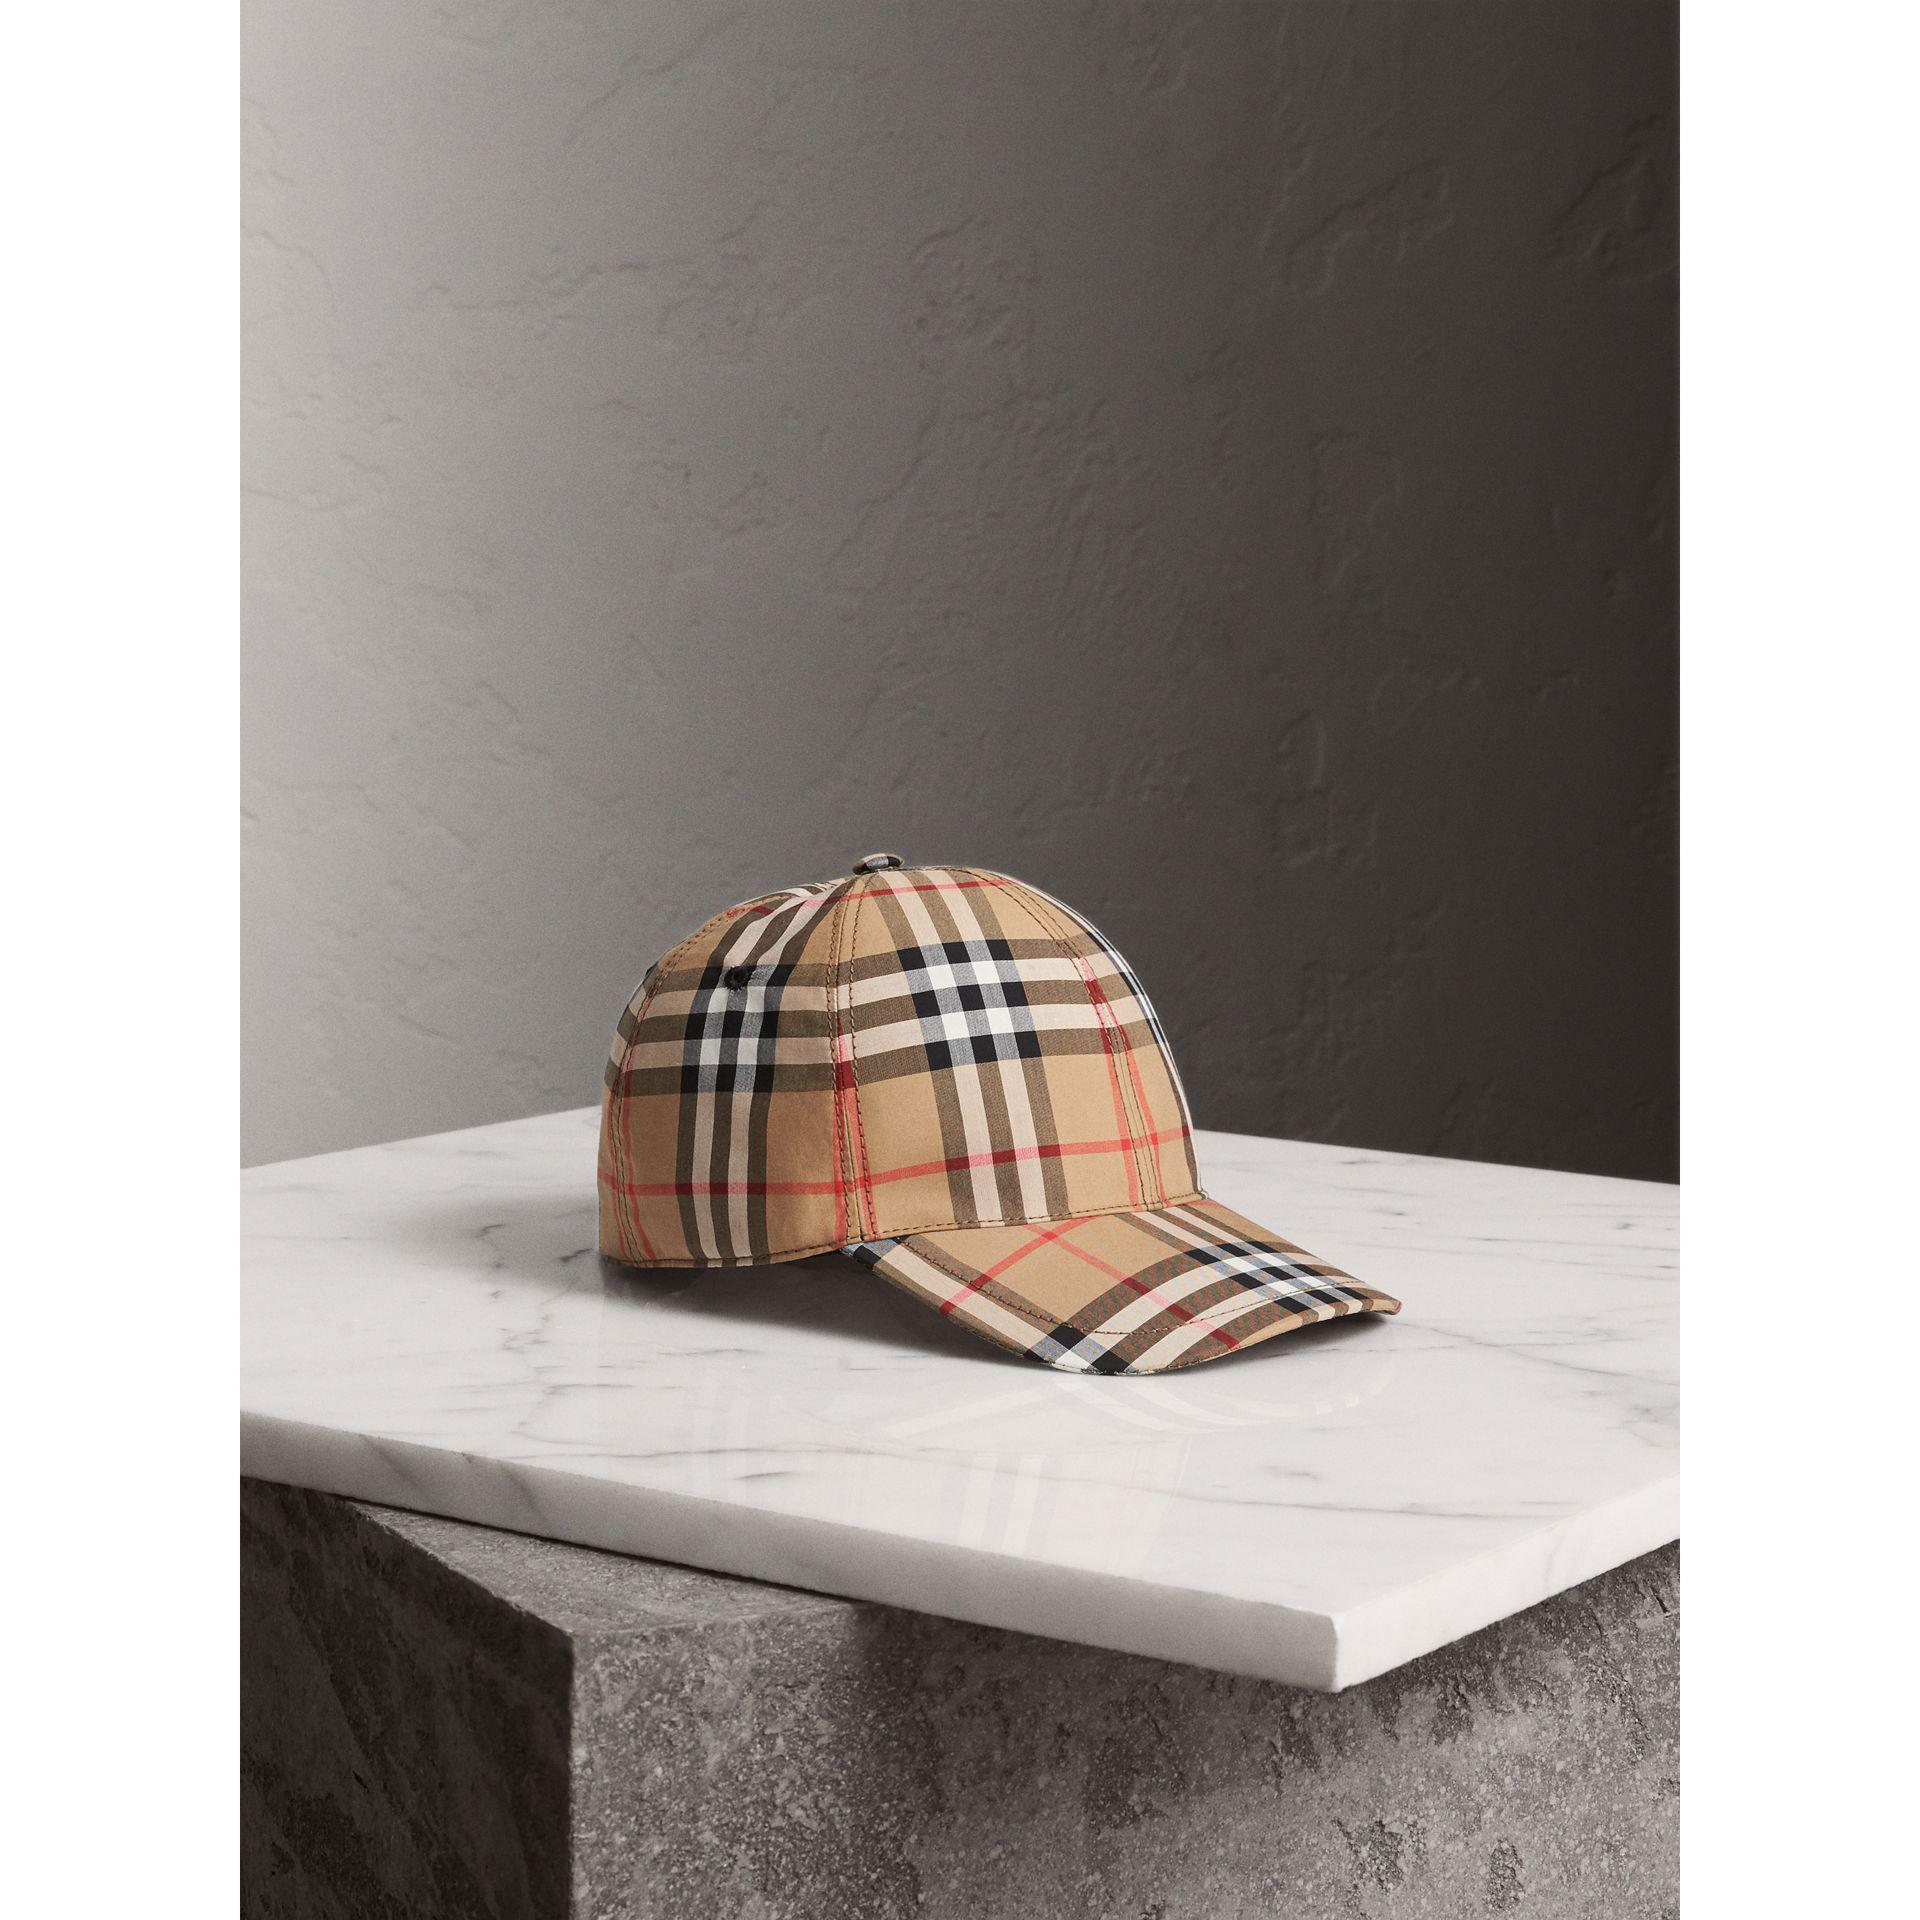 Lyst - Burberry Vintage Check Baseball Cap 62b606e8b